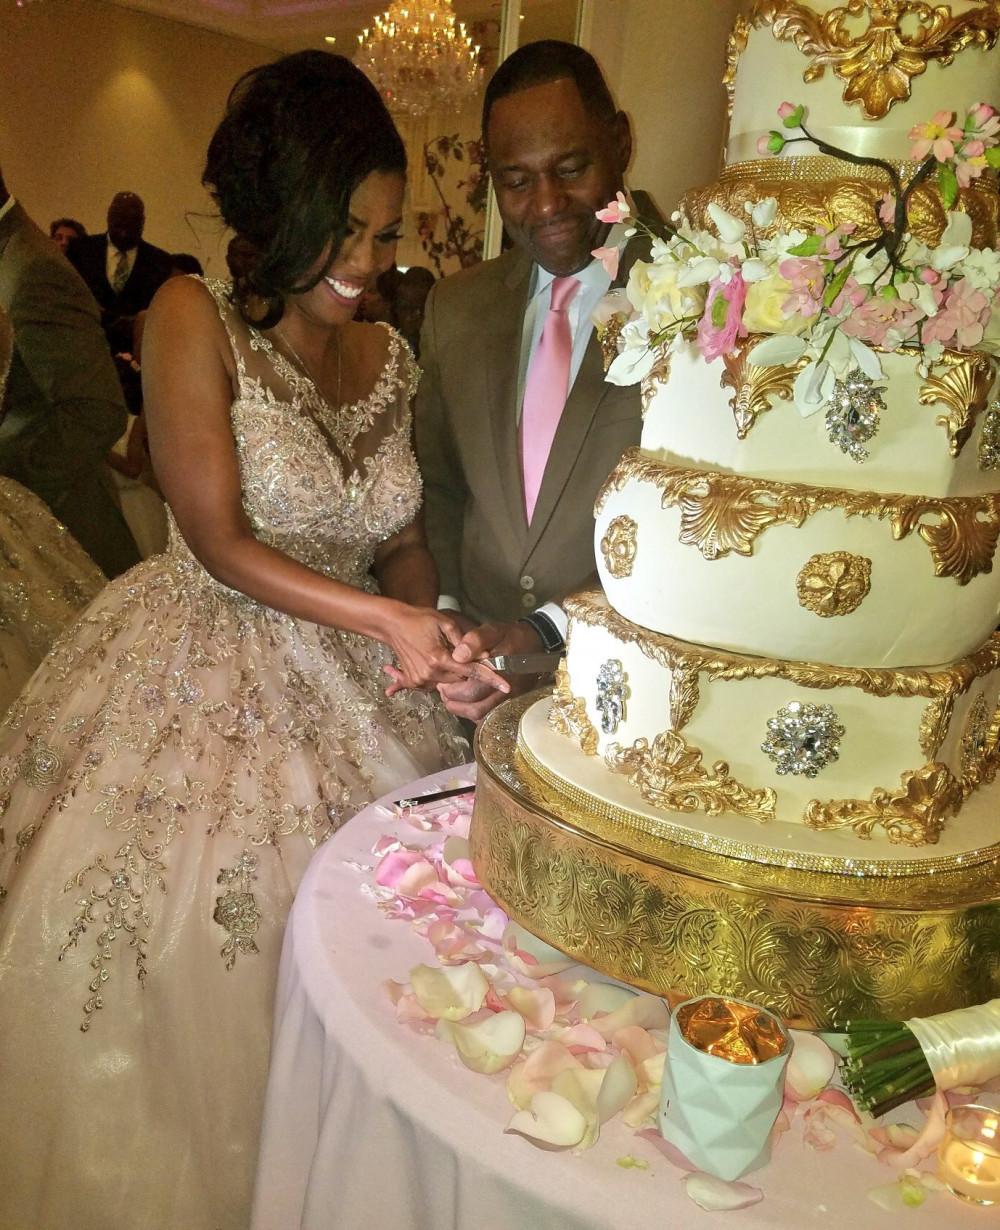 Omarosa Manigault Gets Married To Her Beau Pastor John